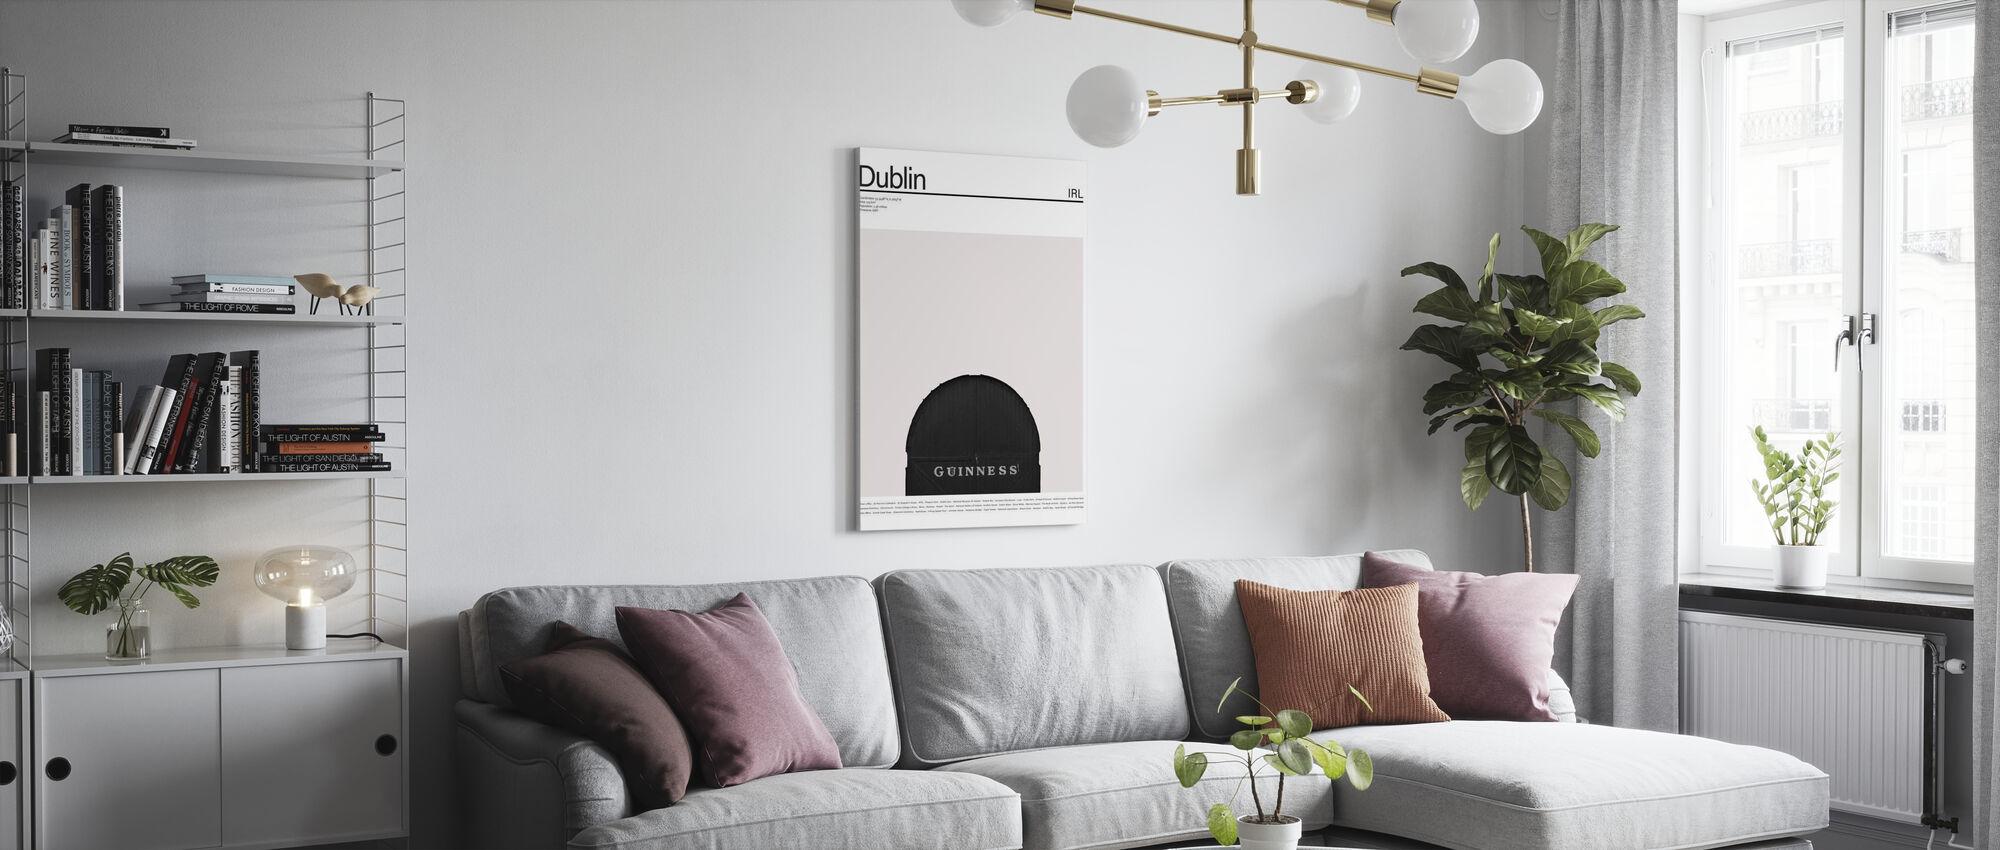 City Dublin I - Canvas print - Living Room